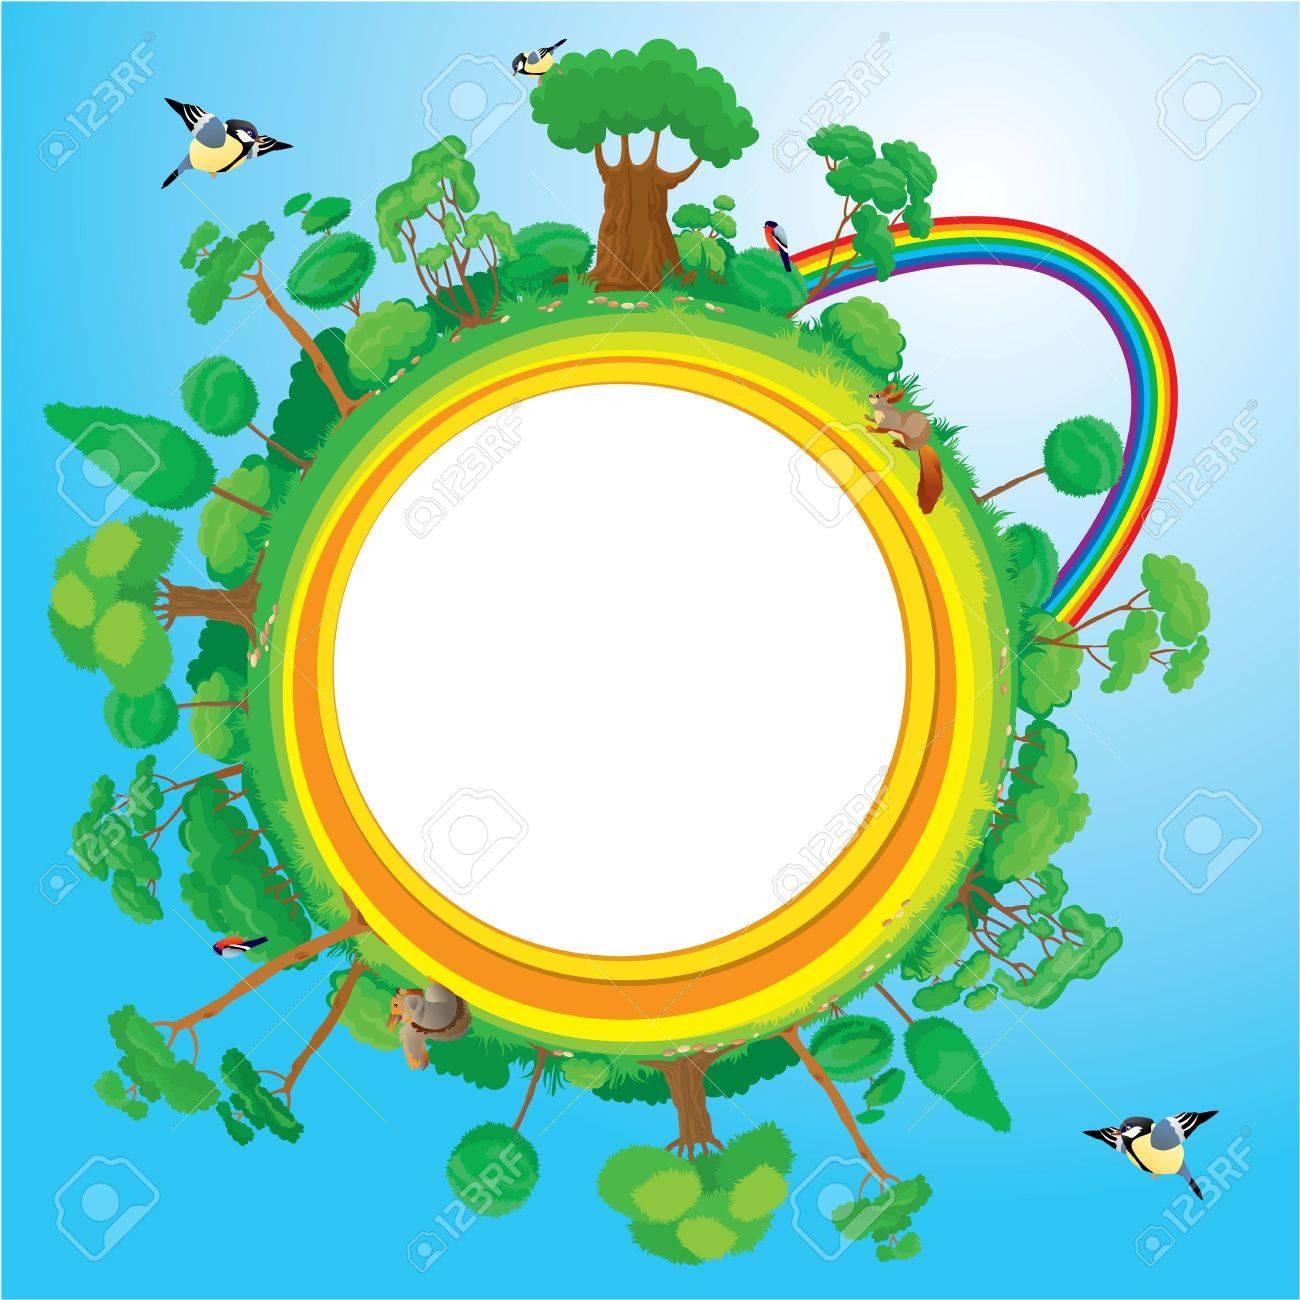 Globe with green trees, birds, animals, rainbow - eco concept Stock Vector - 19367424